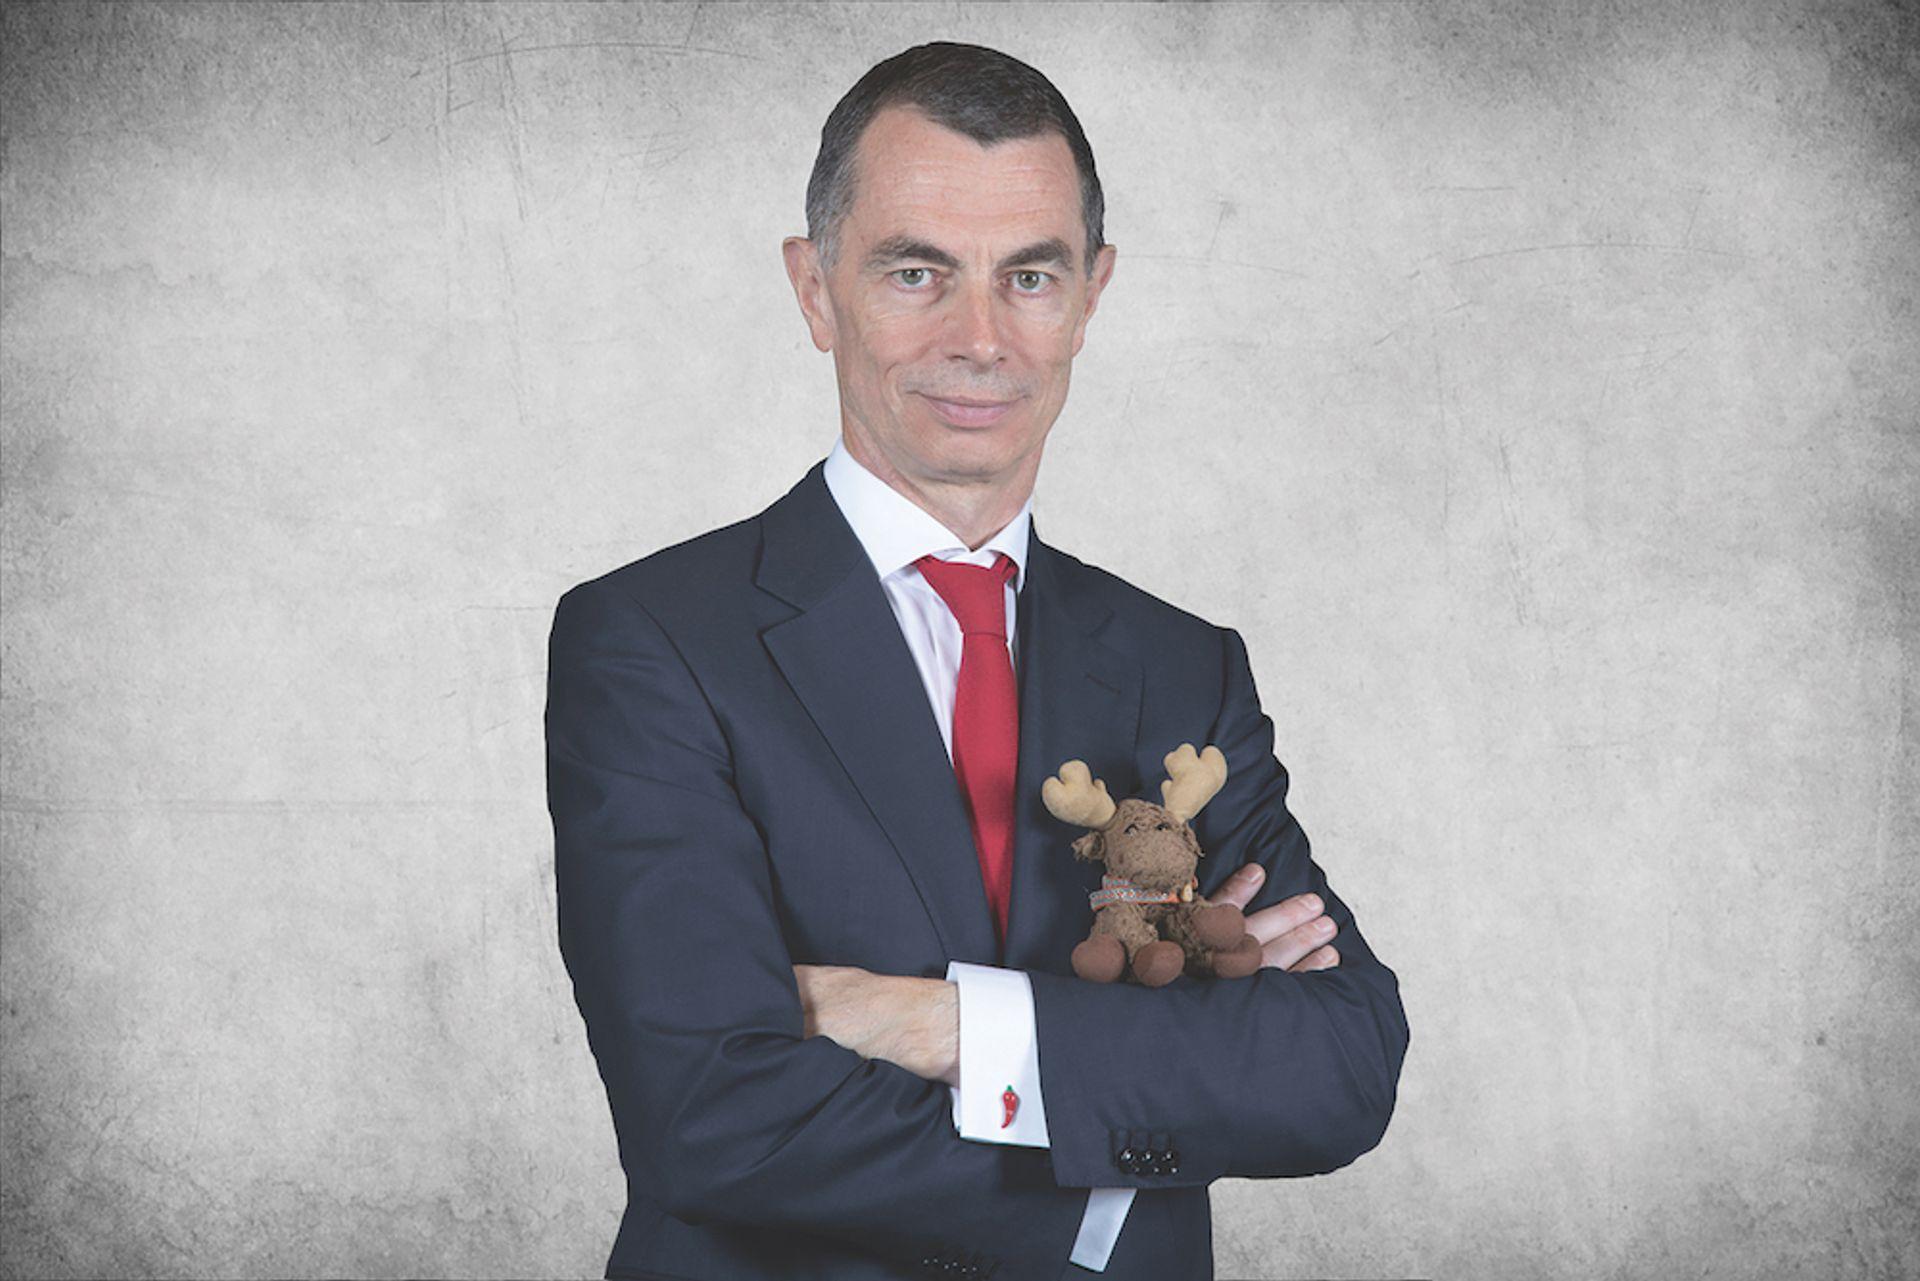 UniCredit's chief executive Jean Pierre Mustier UniCredit